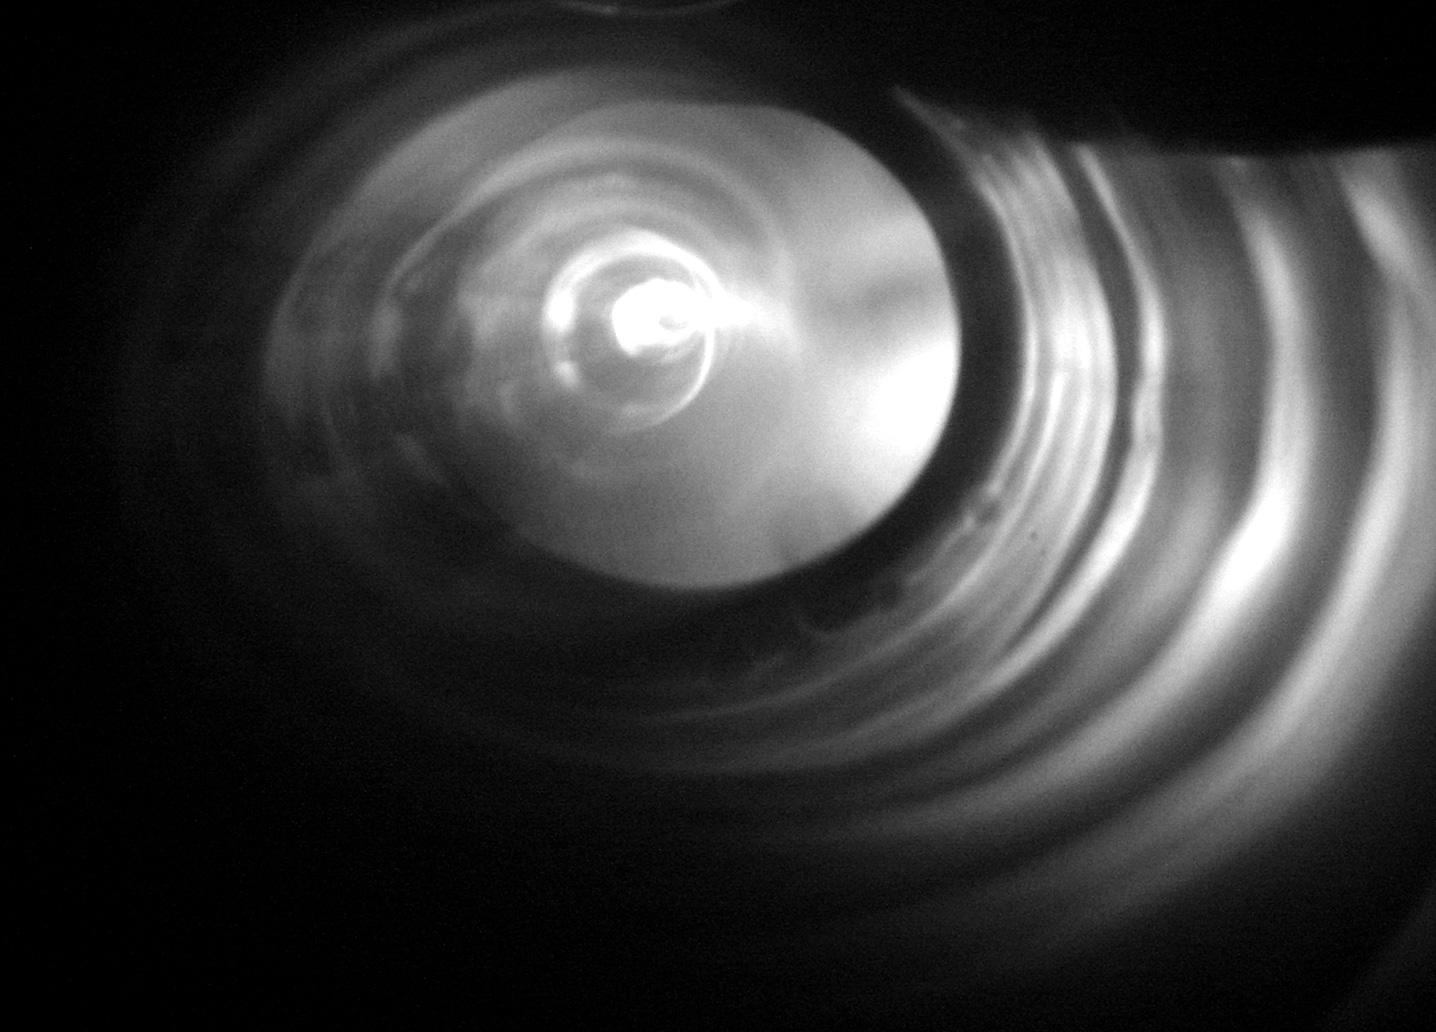 Light + Glass Photographic Form Study